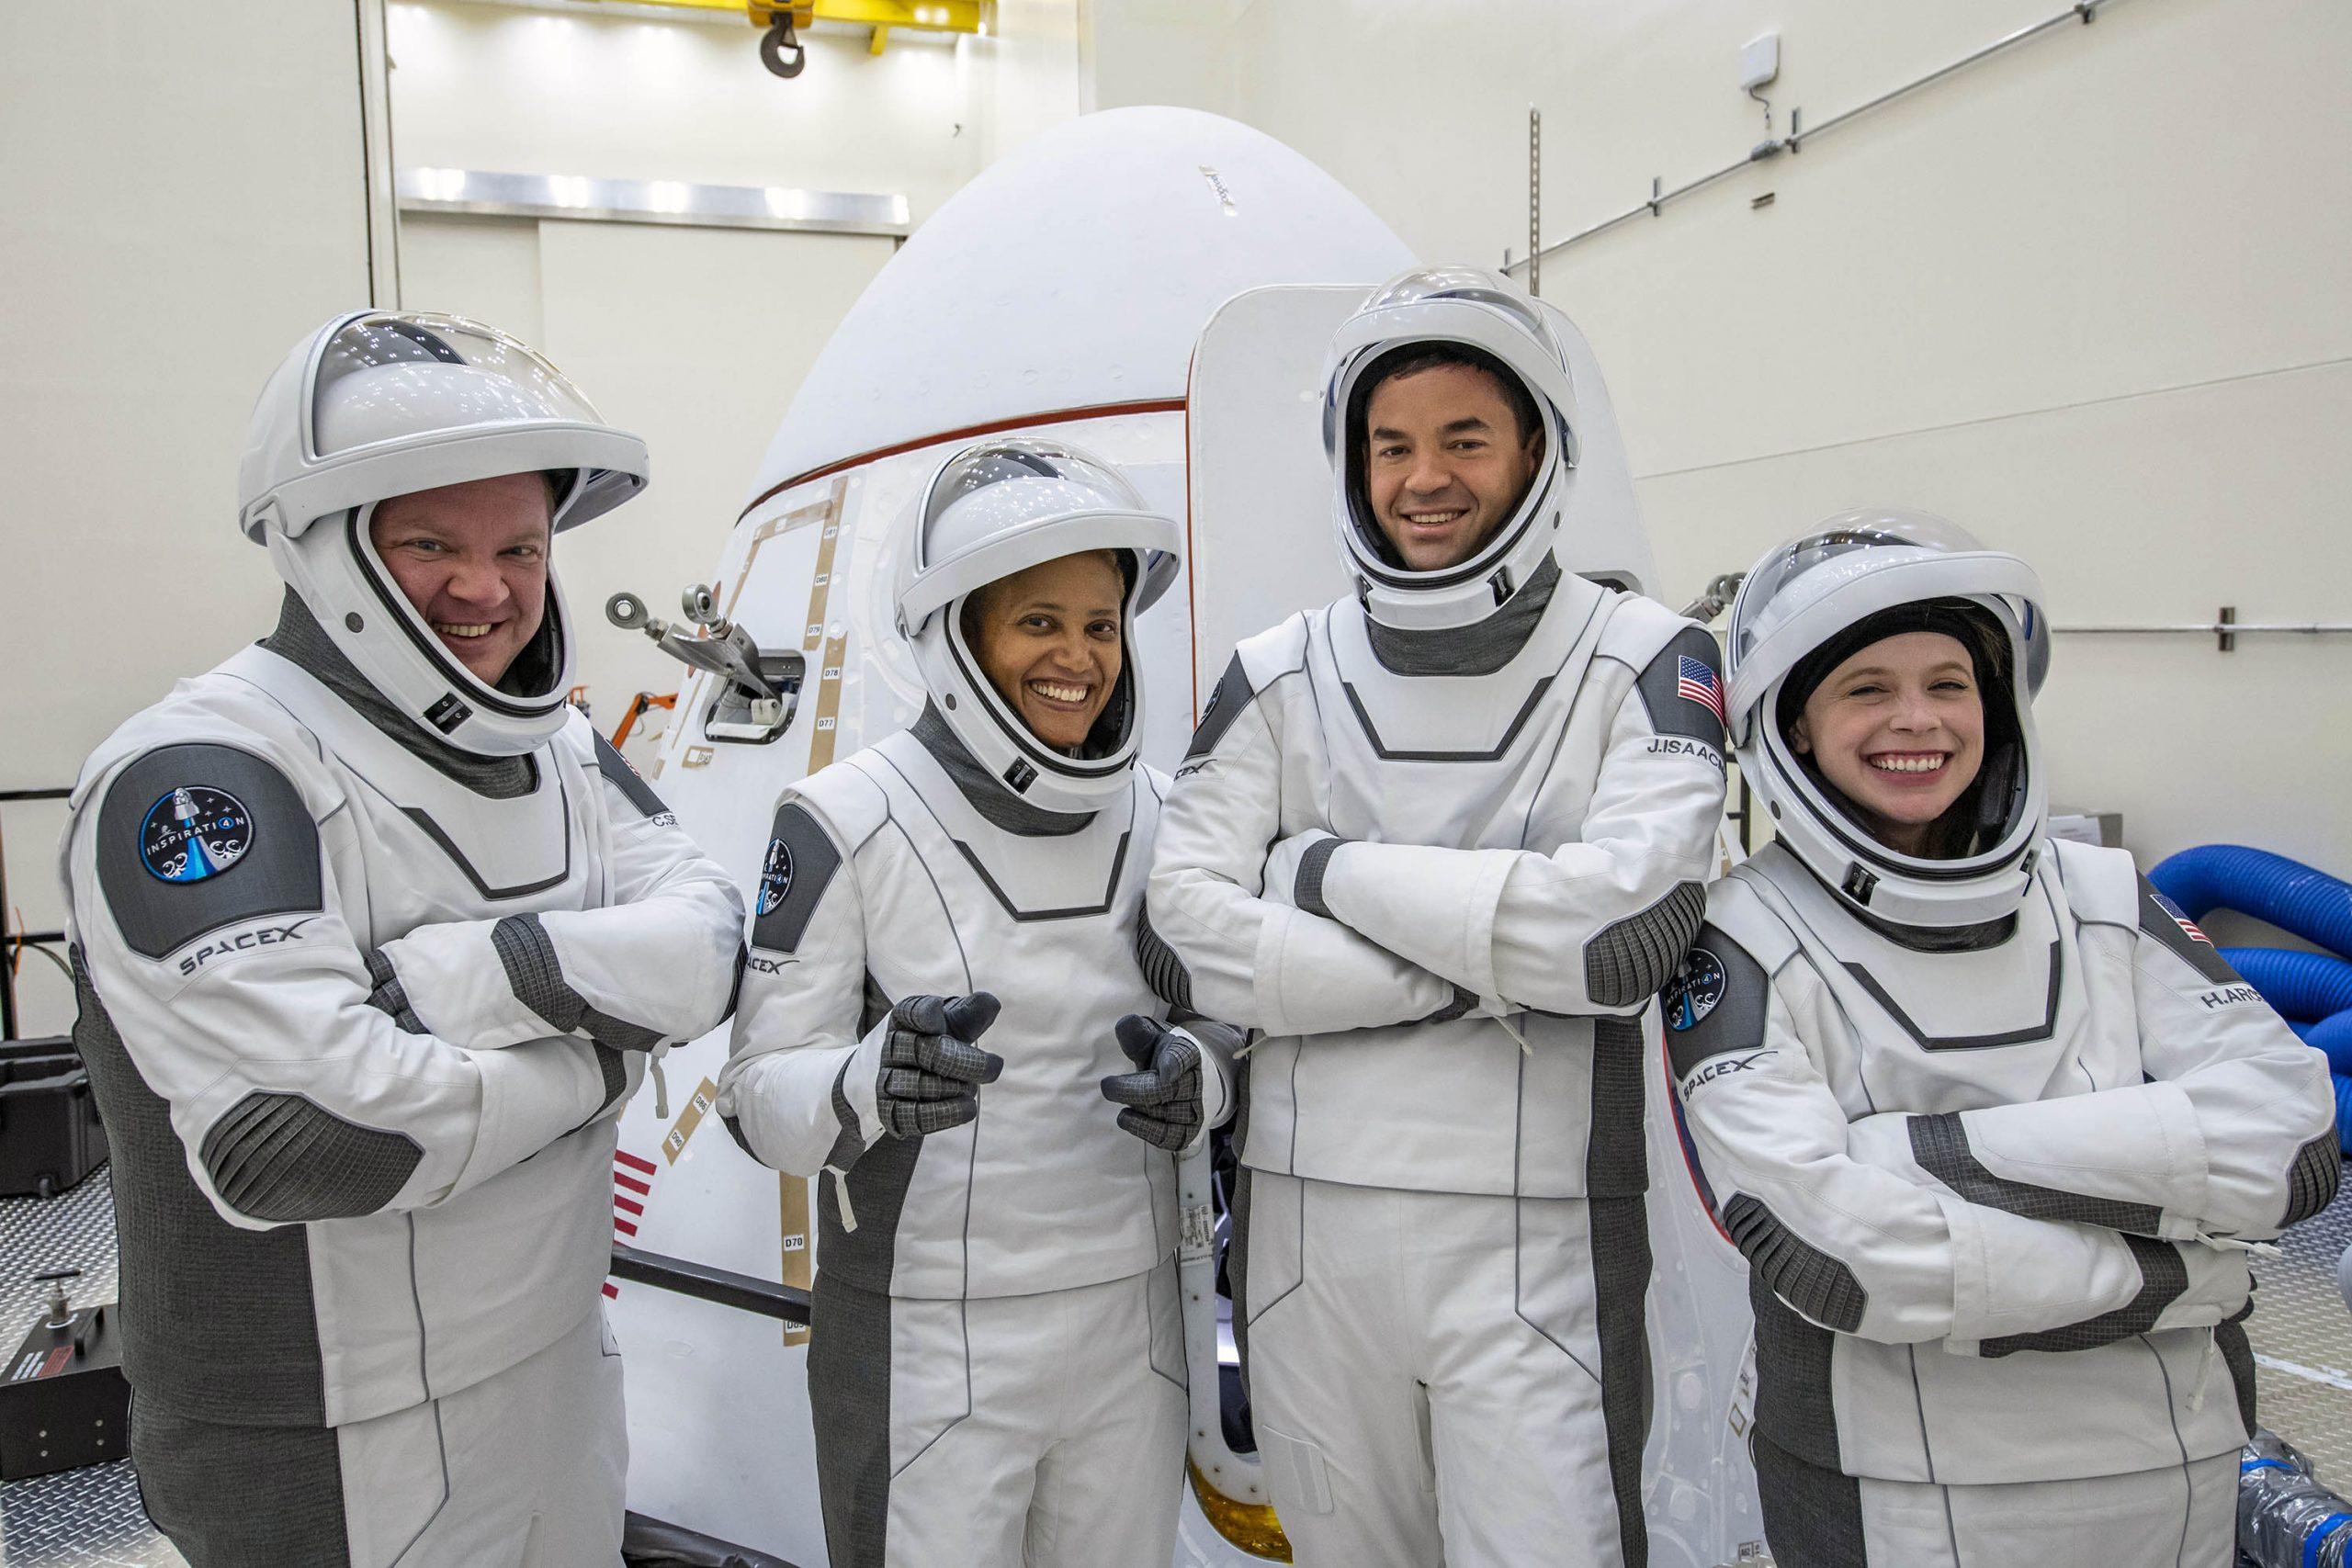 L'equipaggio di Inspiration4. Da sinistra: Christopher Sembroski; Sian Proctor; Jared Isaacman; Hayley Arceneaux. Credits: Inspiration4